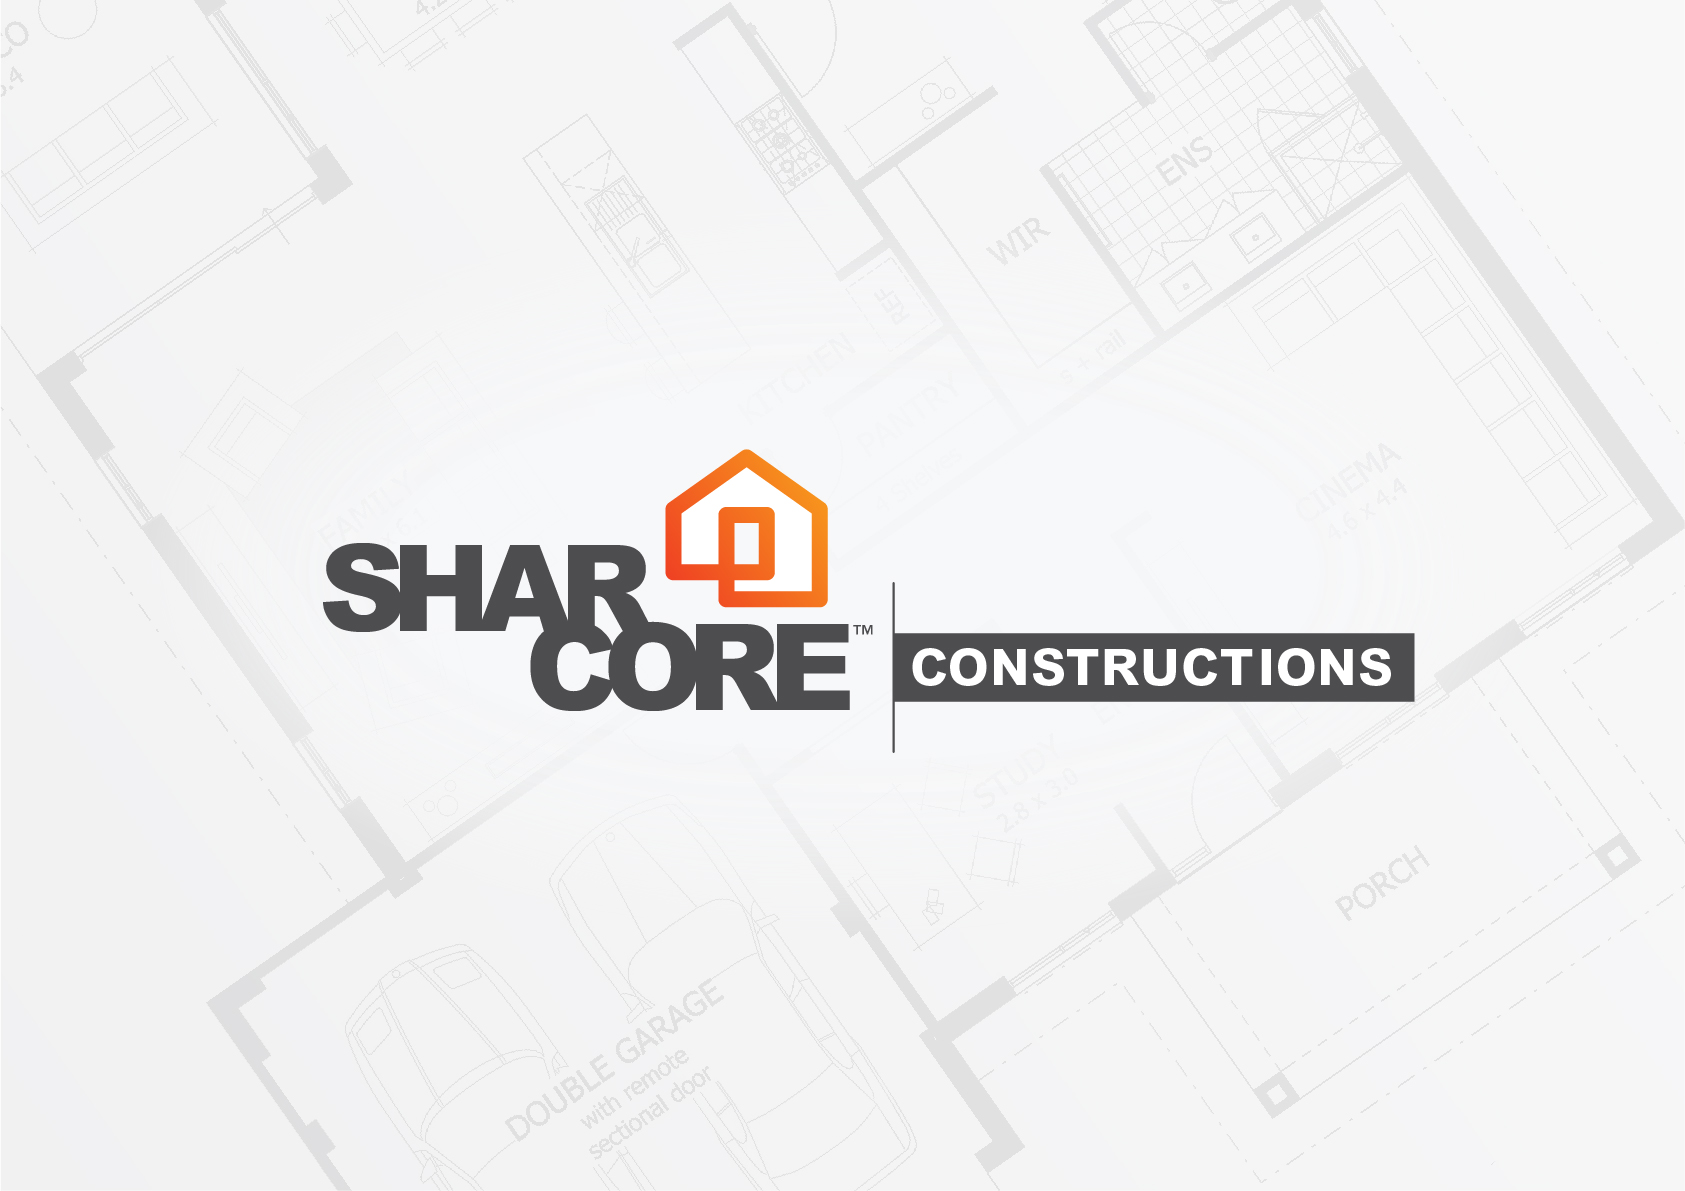 Sharcore - Artboard 2.jpg